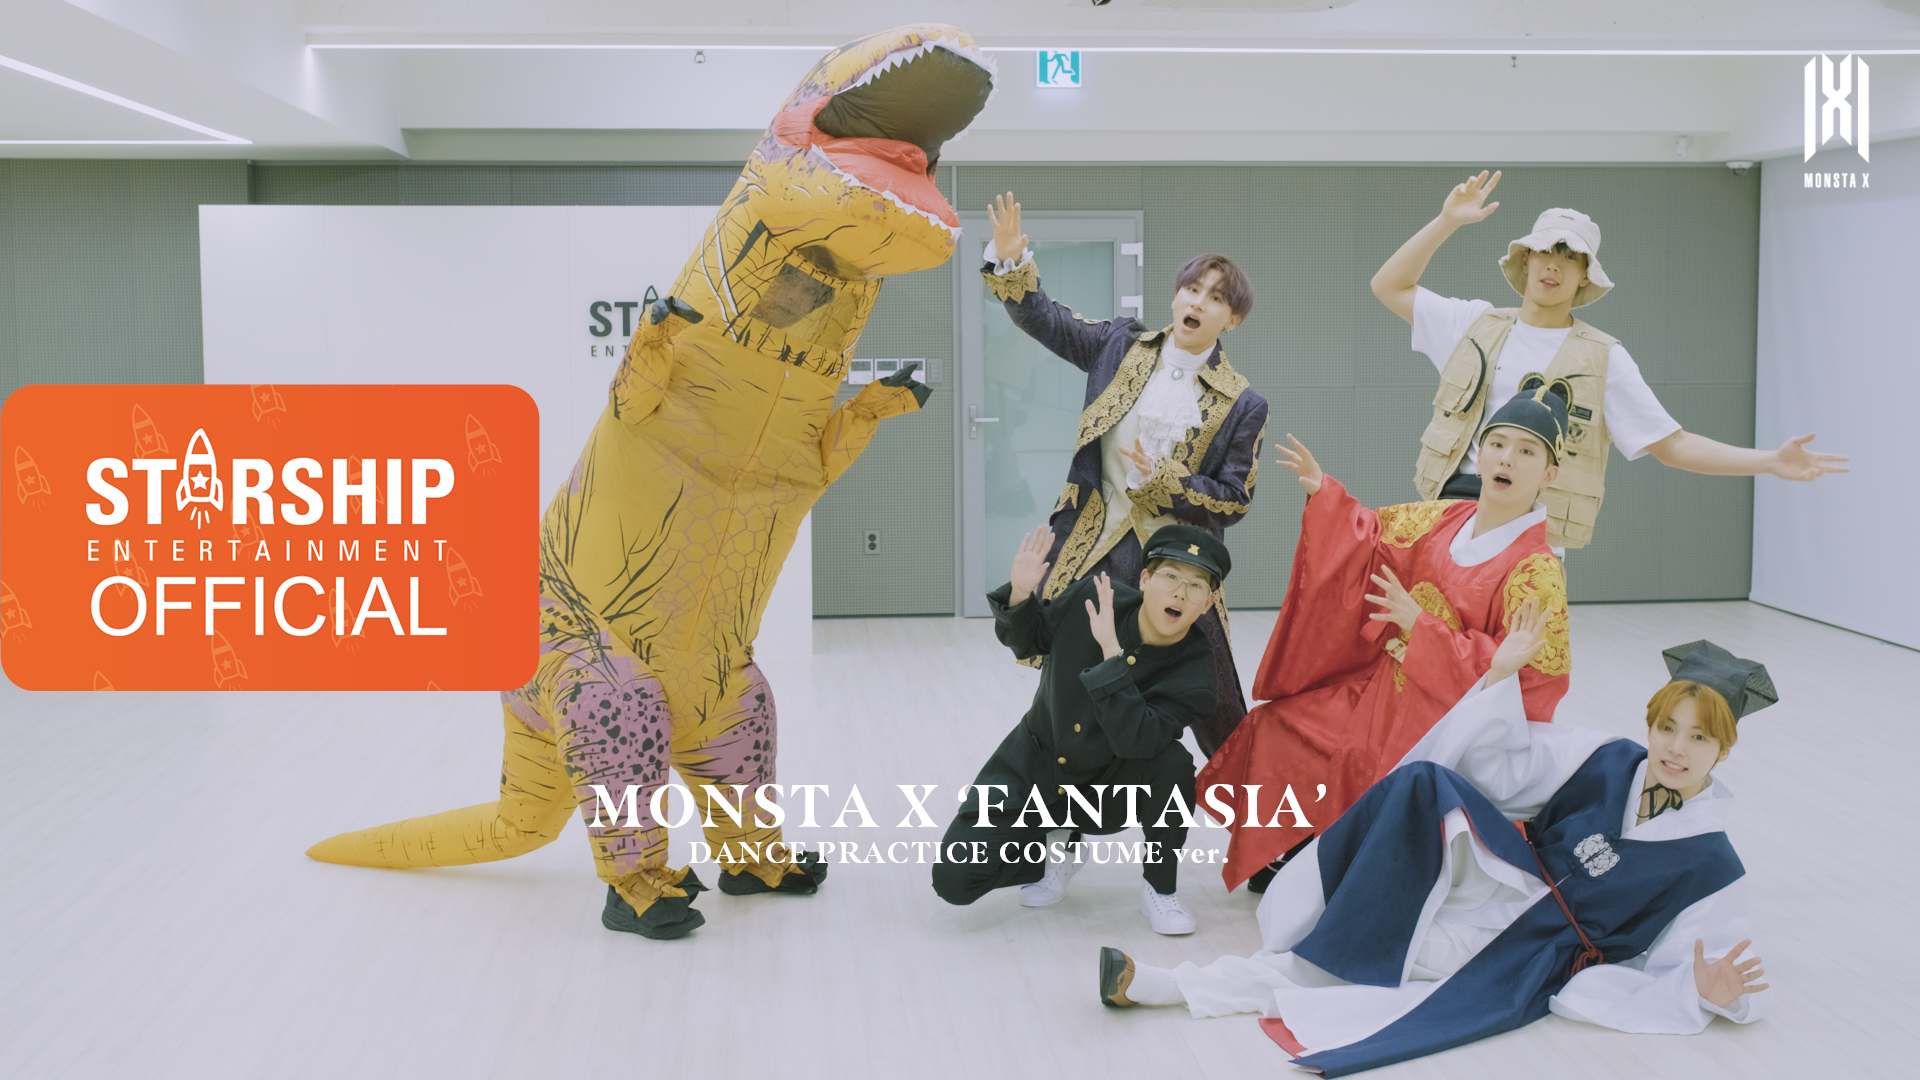 [Dance Practice] MONSTA X (몬스타엑스) - FANTASIA (COSTUME ver.)